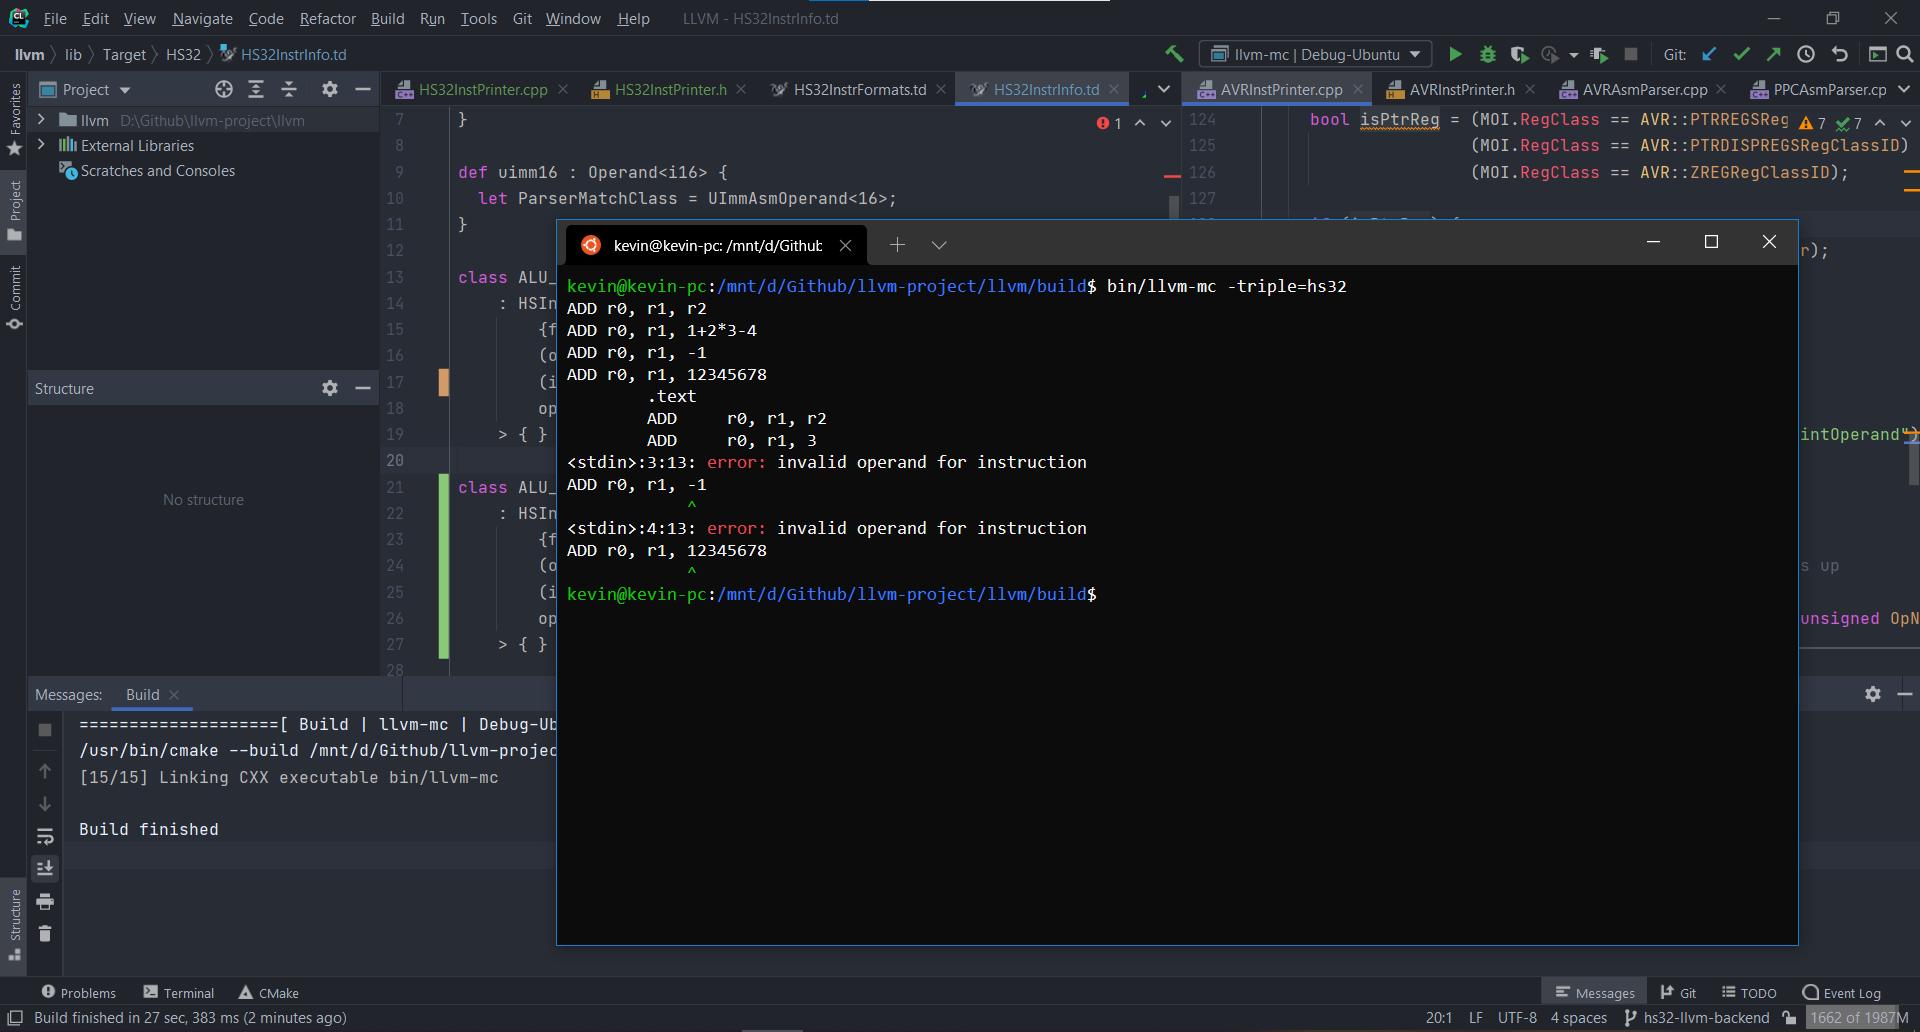 https://cloud-cvzsw5dq2-hack-club-bot.vercel.app/0image.png